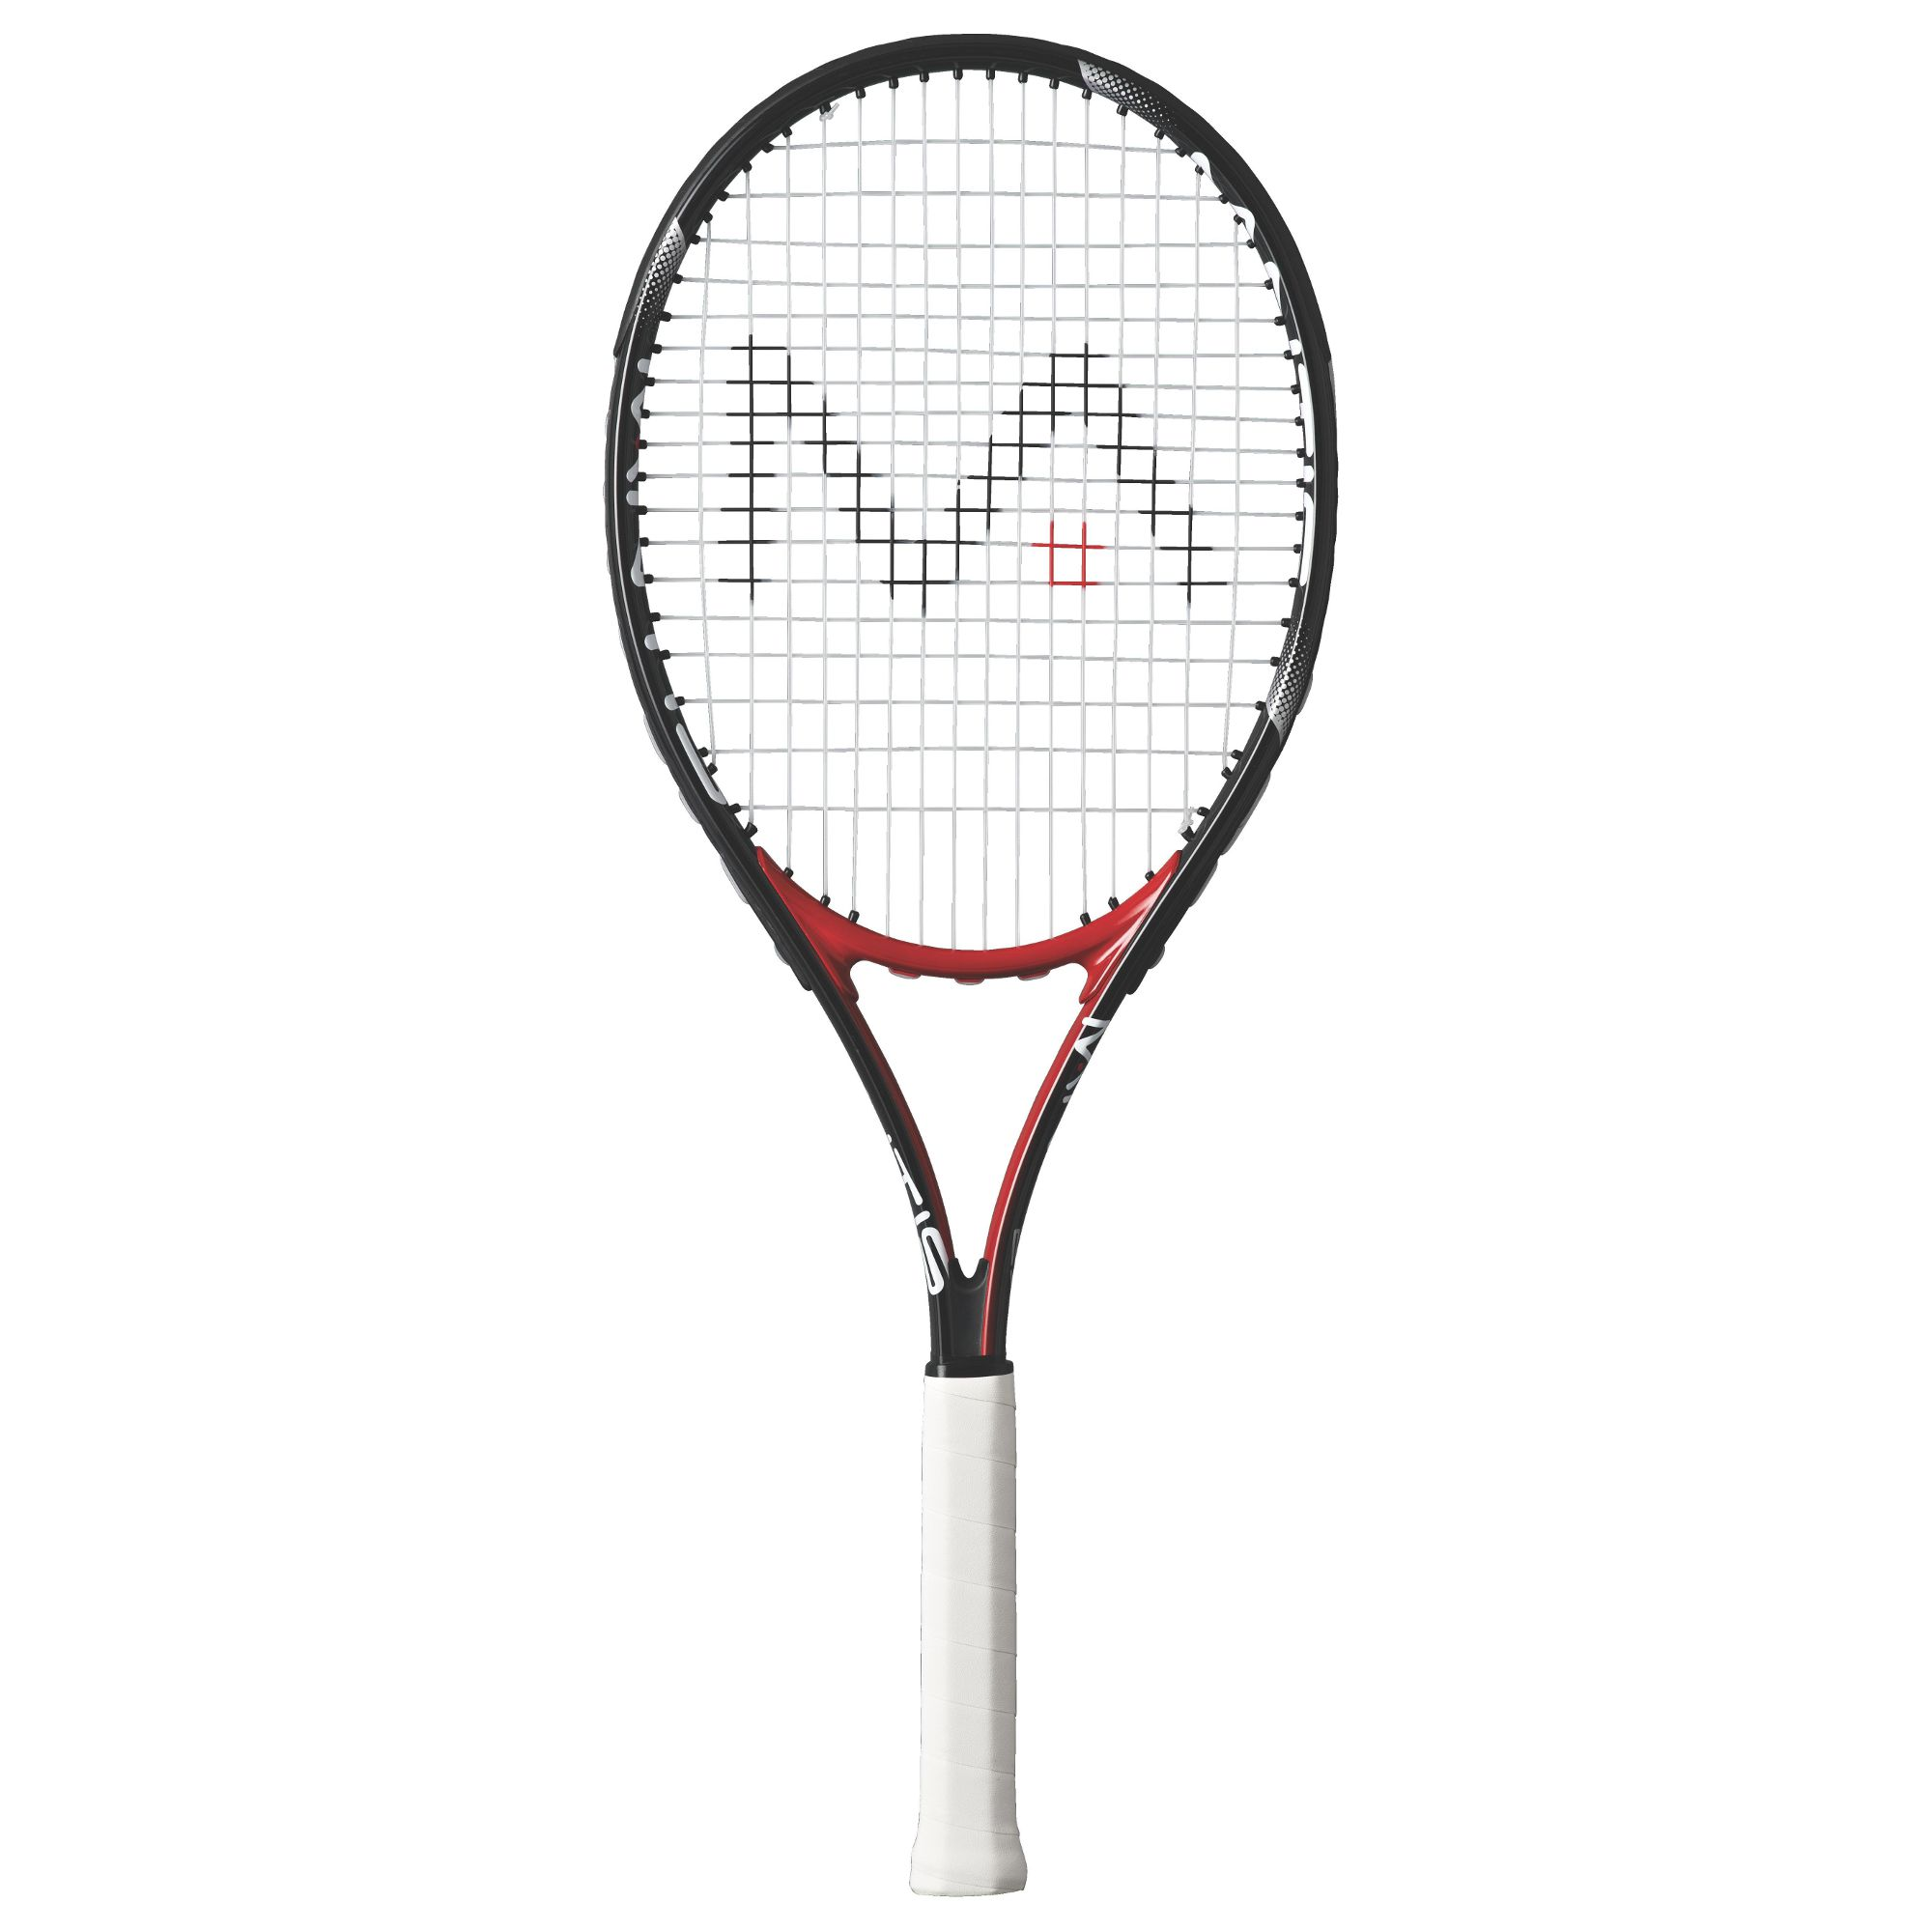 Tennis Bumper Guard : Mantis junior tennis racket leedo